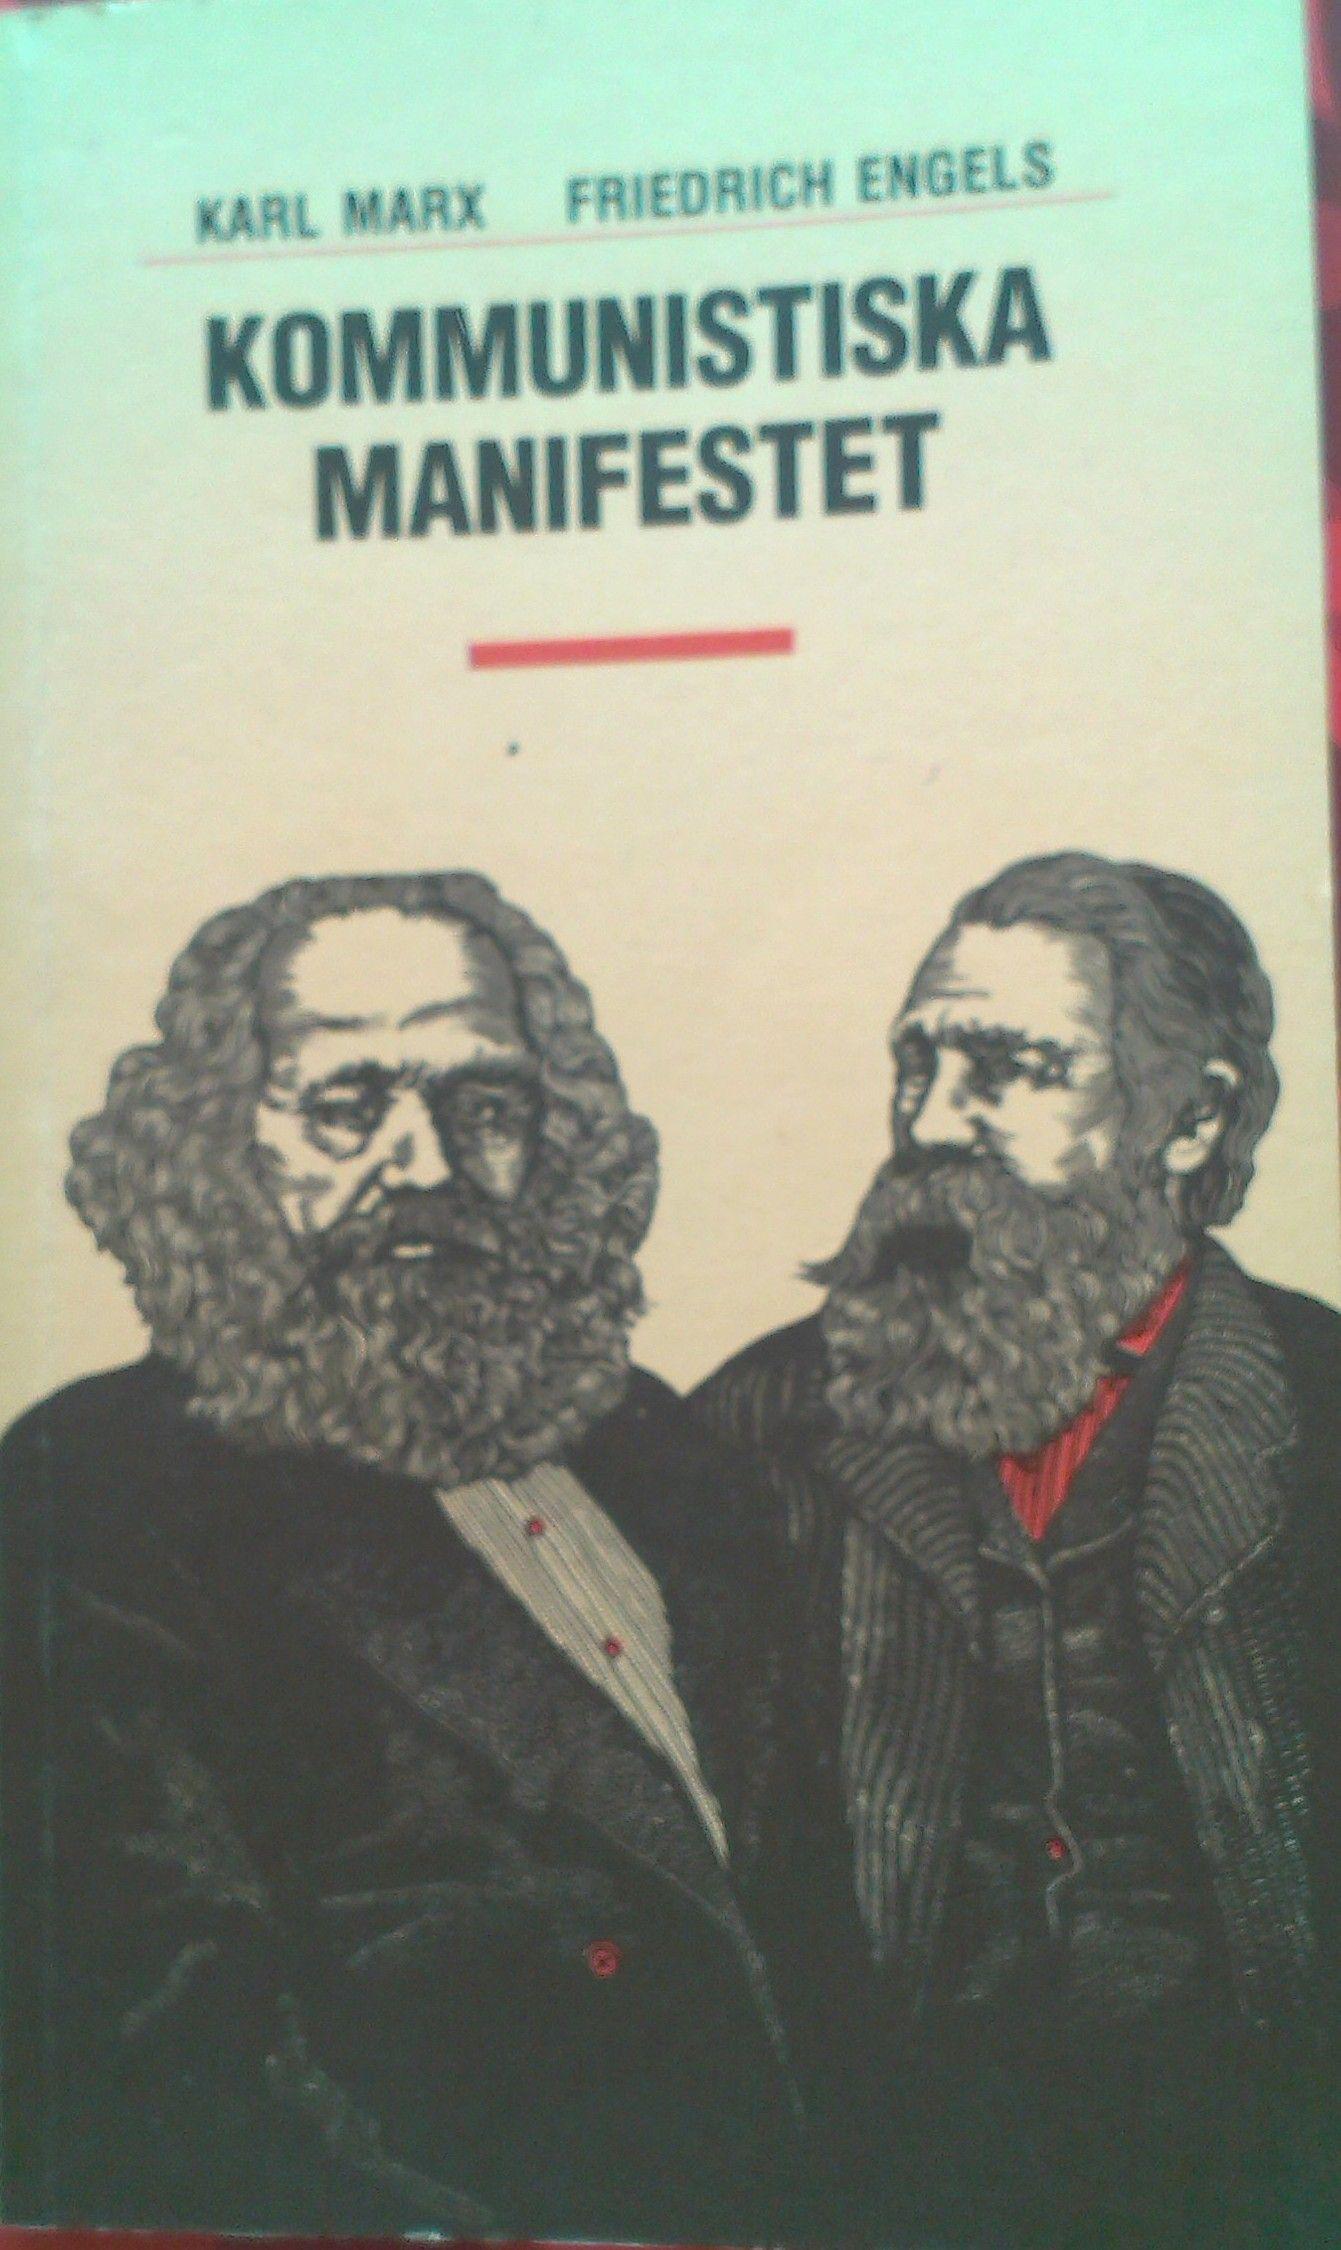 MARX, Karl; ENGELS, Friedrich. Kommunistiska Manifestet. Stockholm: Arbetarkultur, 1986. 72 p. ISBN 91-7014-209-2